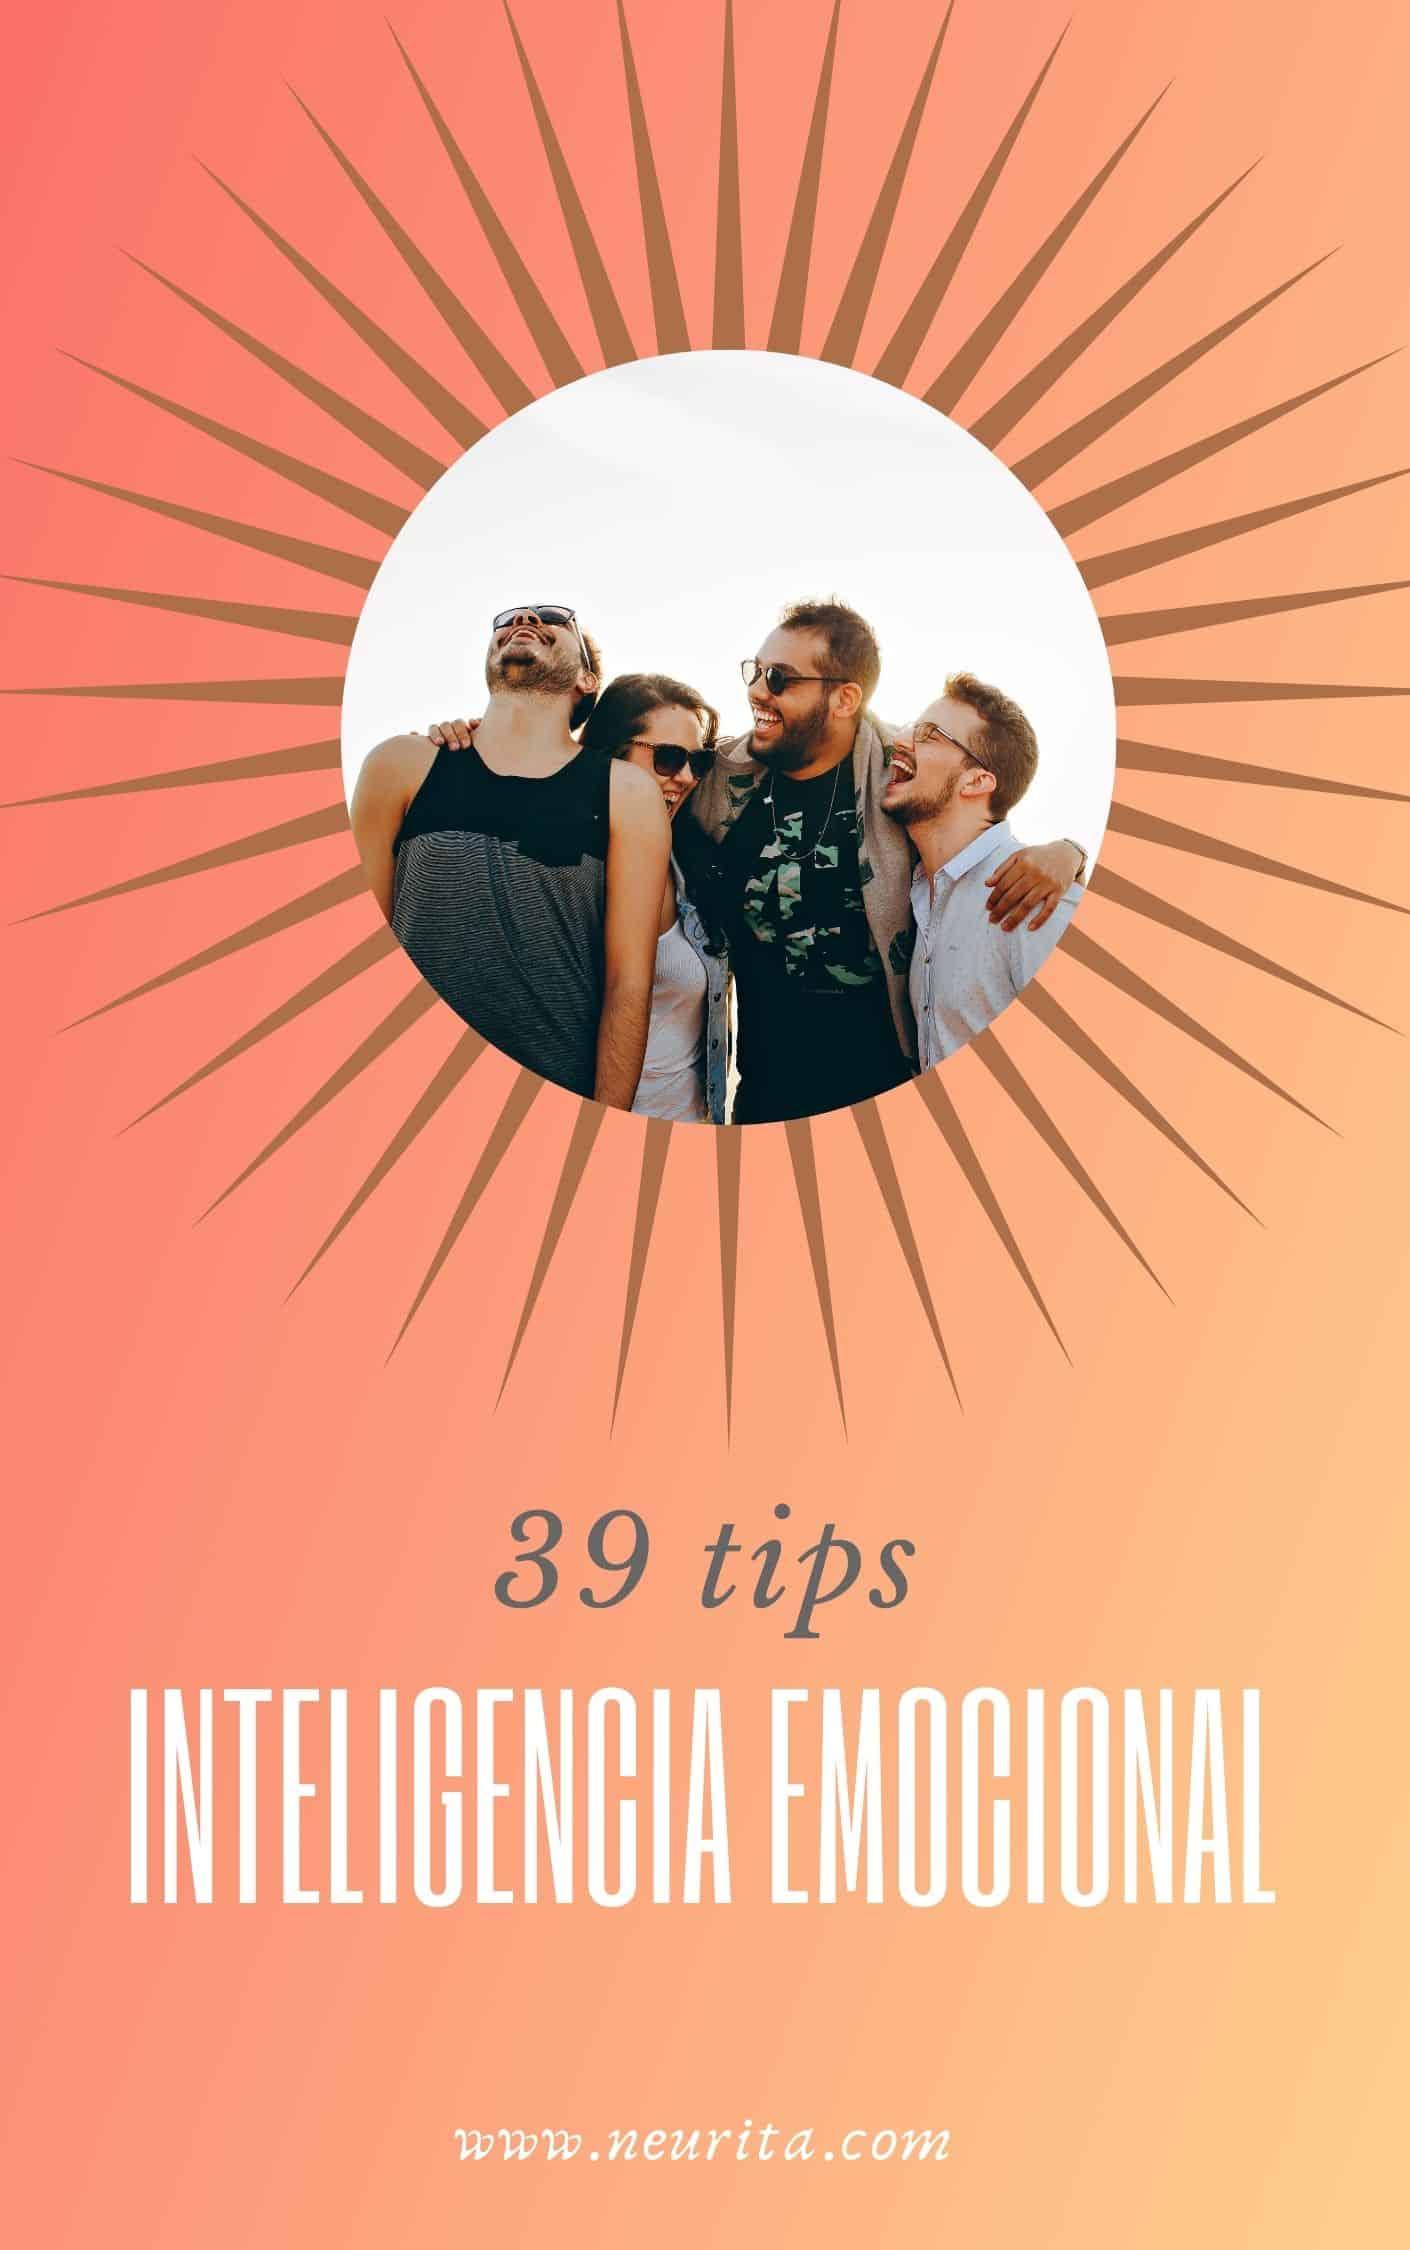 Inteligencia Emocional Neurita • Neurita | Blog de Psicología